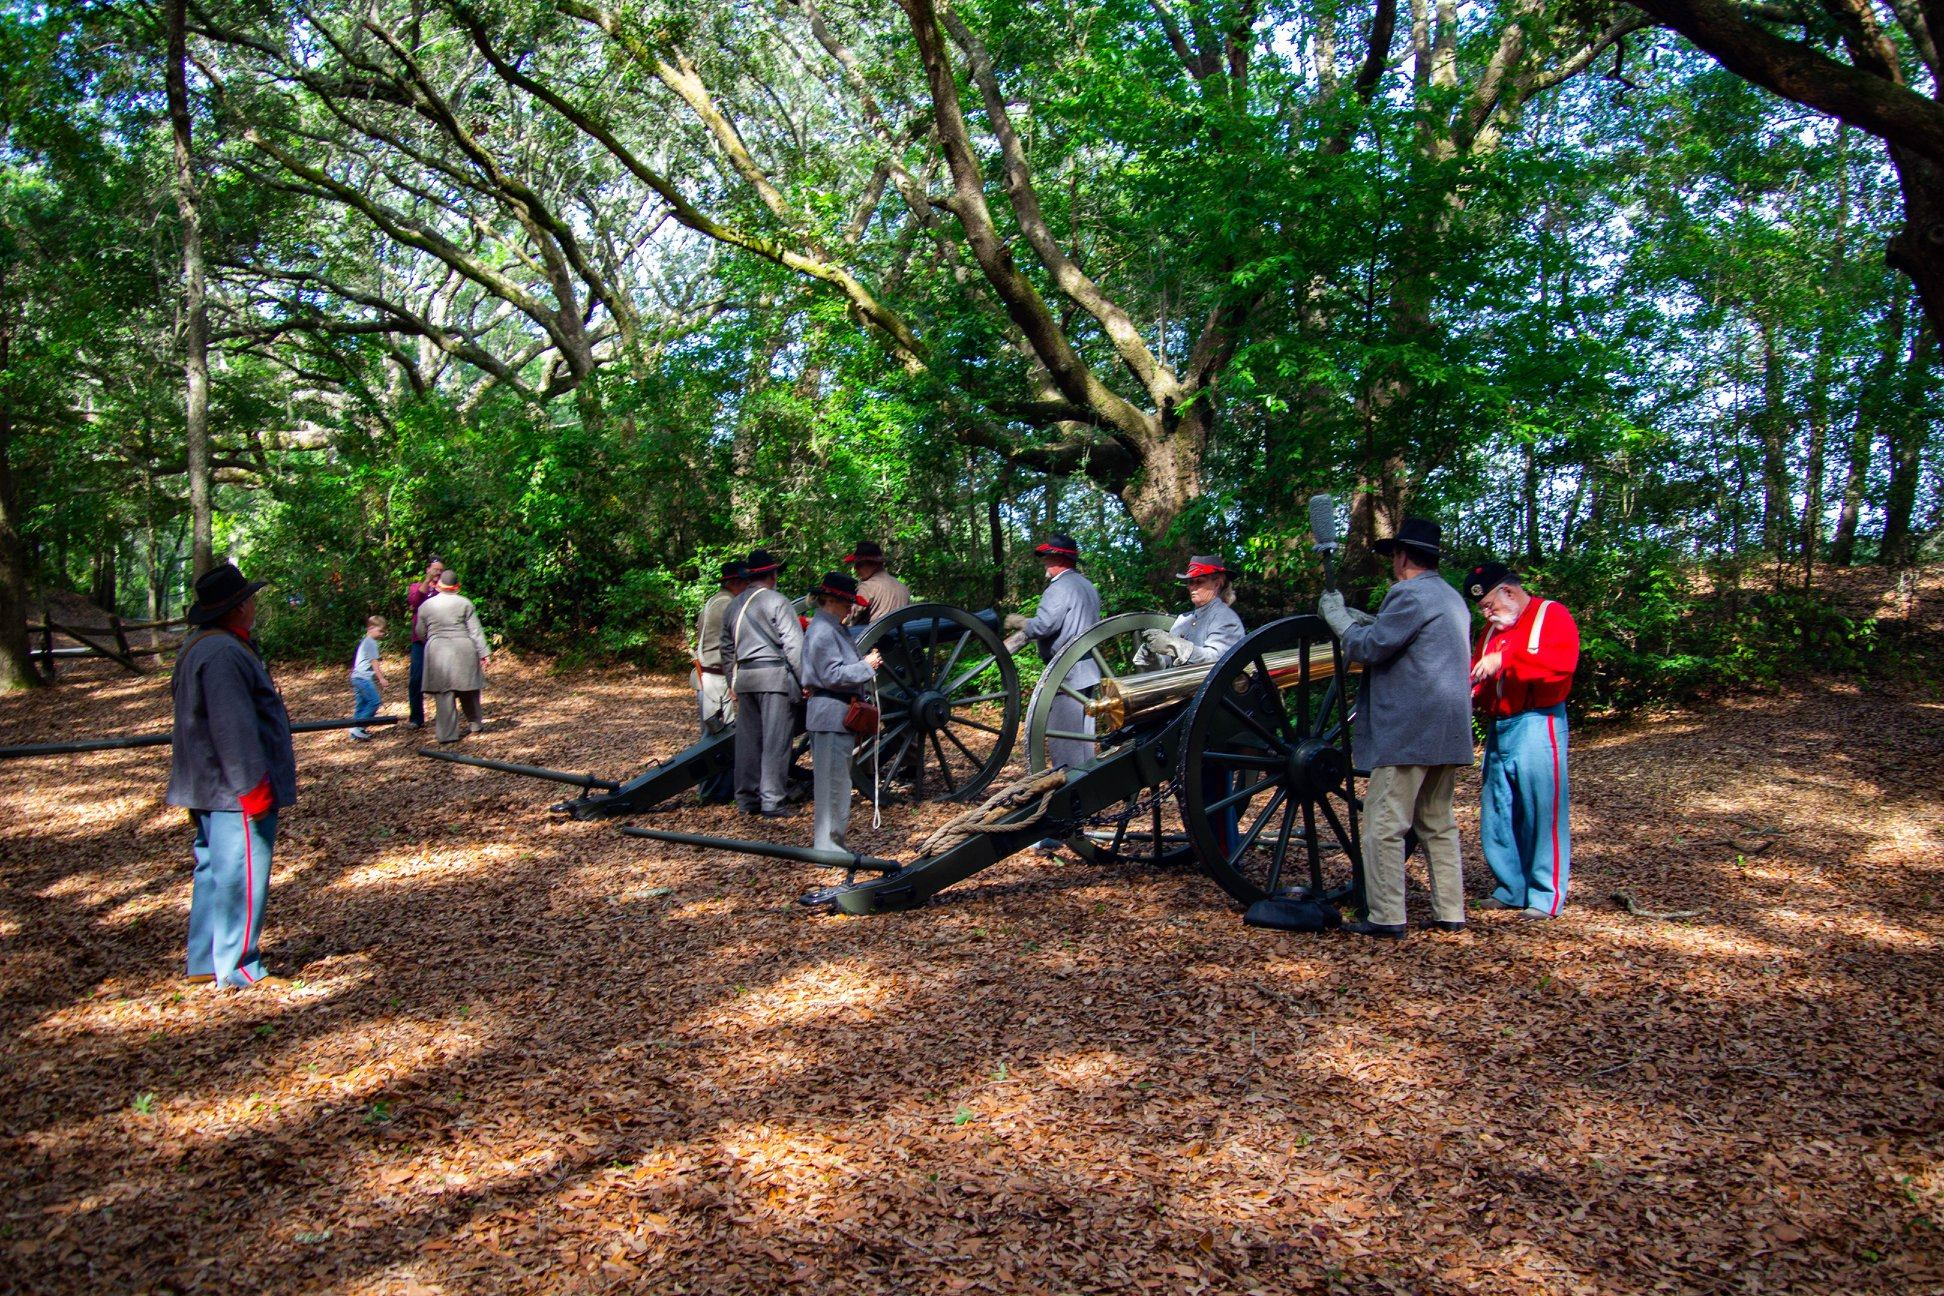 The annual anniversary of the Battle of Secessionville 11